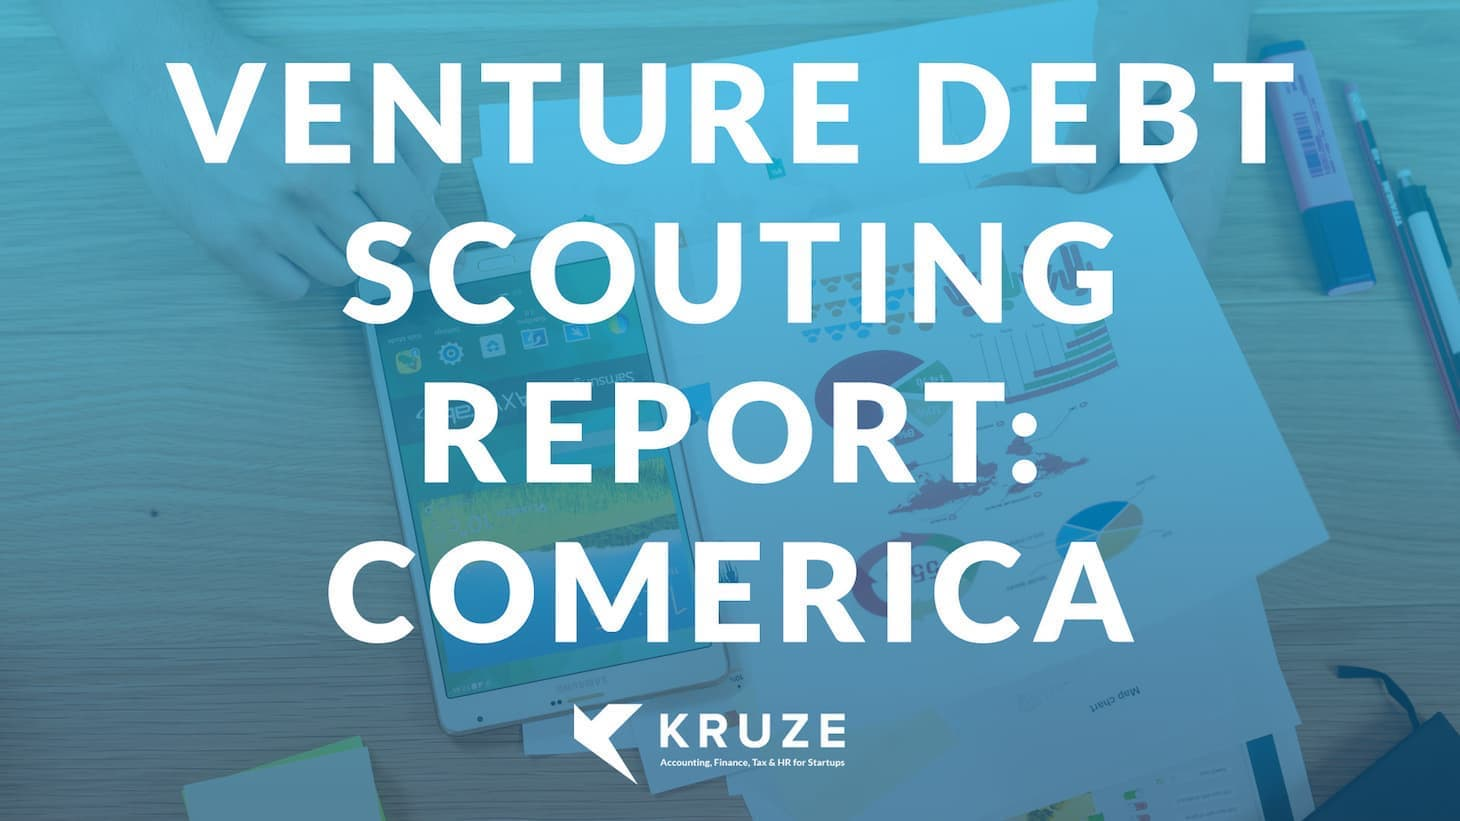 Venture Debt Scouting Report: Comerica